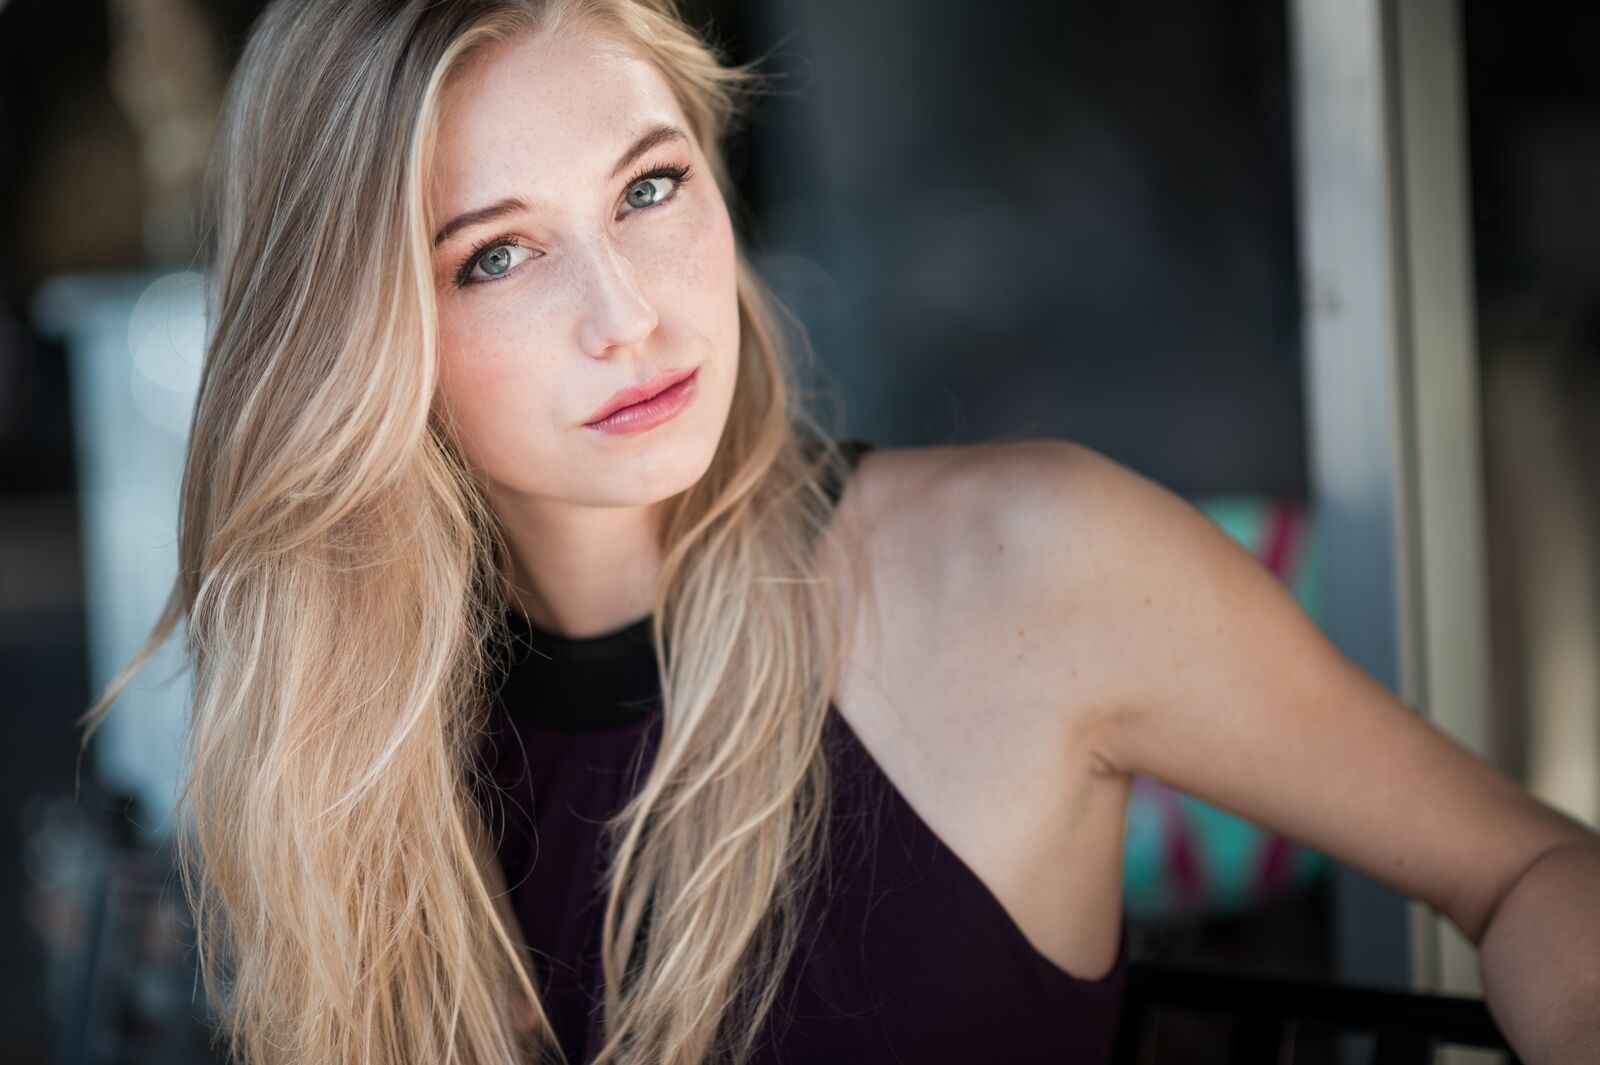 Megan PWP_4717_FullSize_preview.jpeg